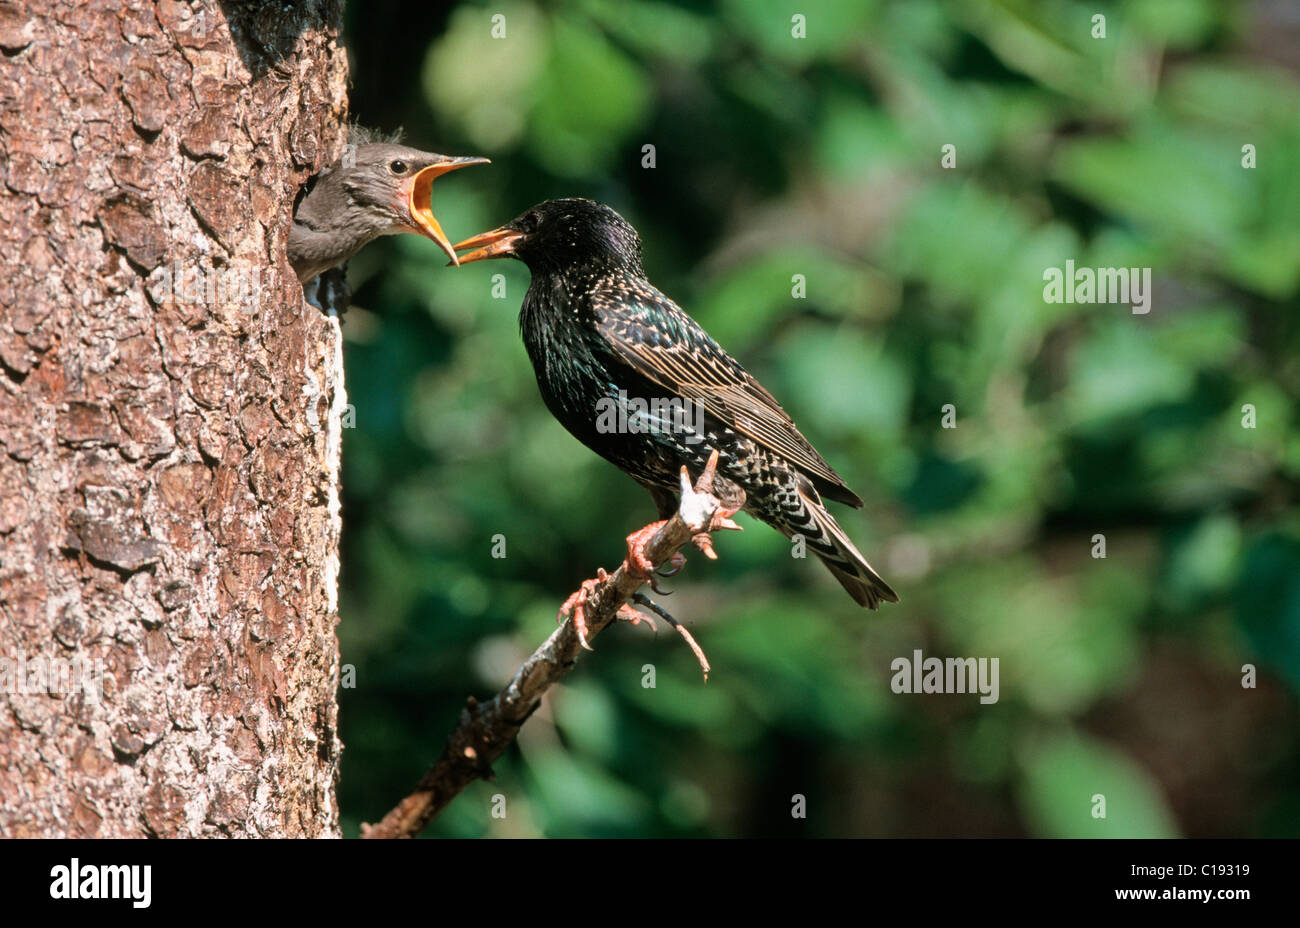 European Starling, Common Starling or Starling (Sturnus vulgaris) at nest Stock Photo